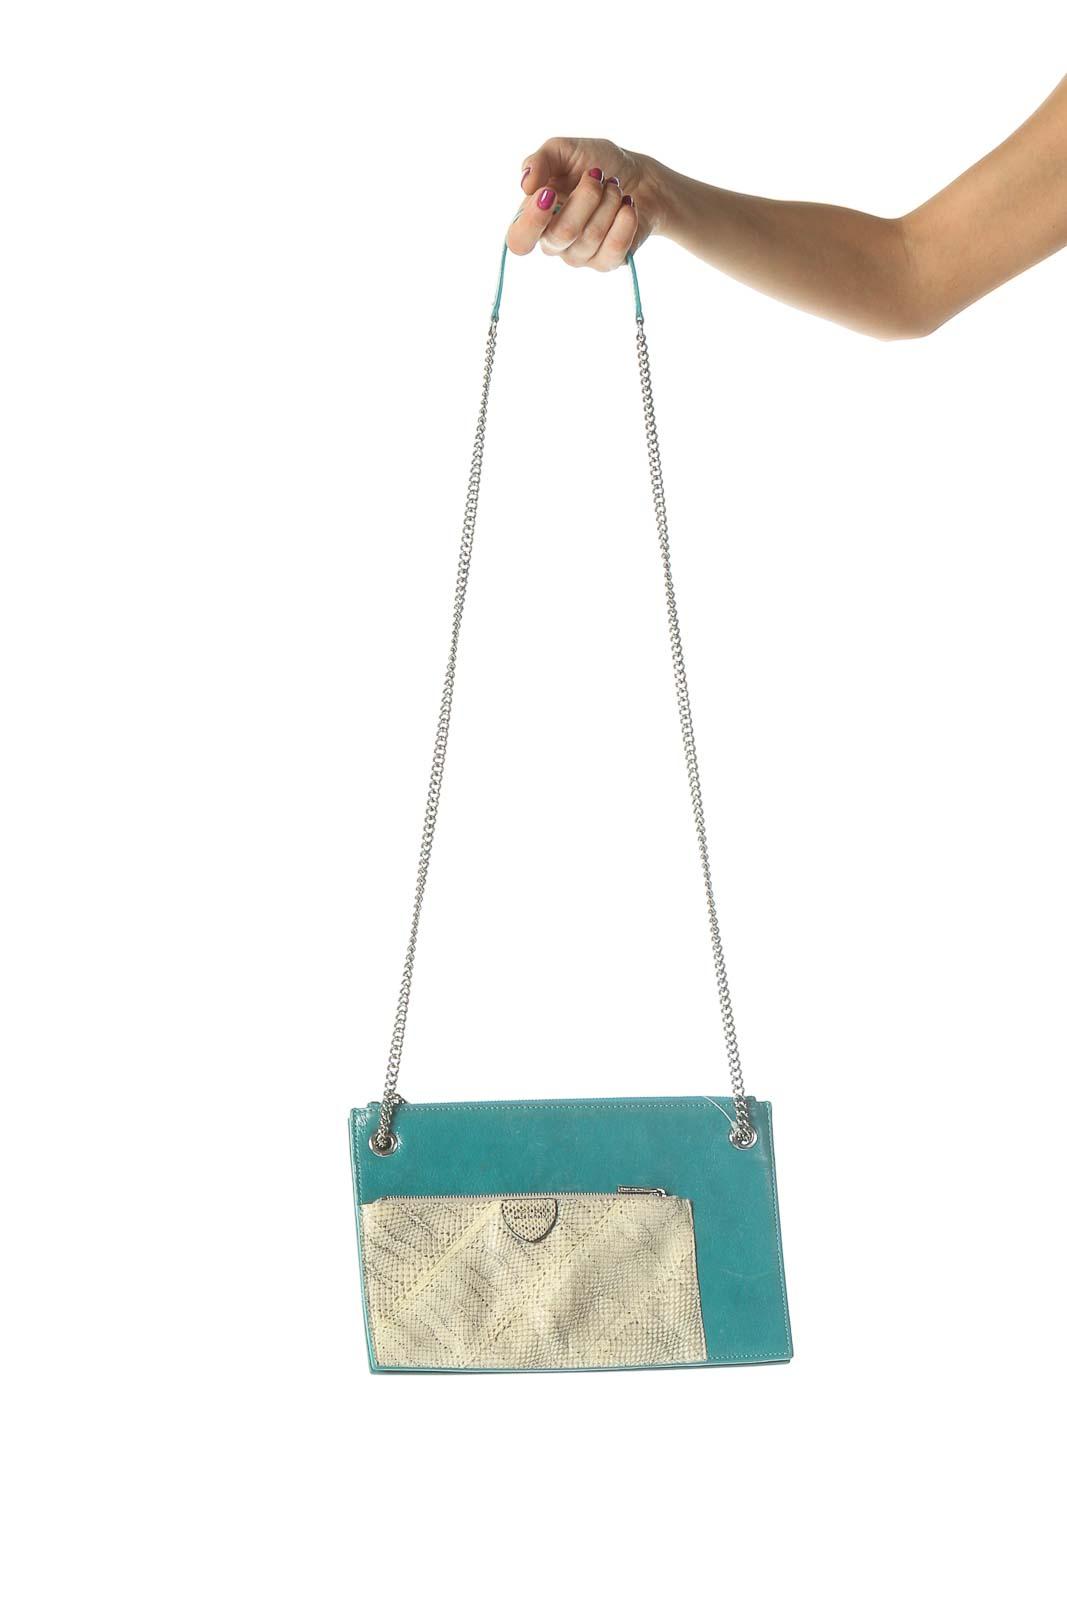 Green Crossbody Bag Front